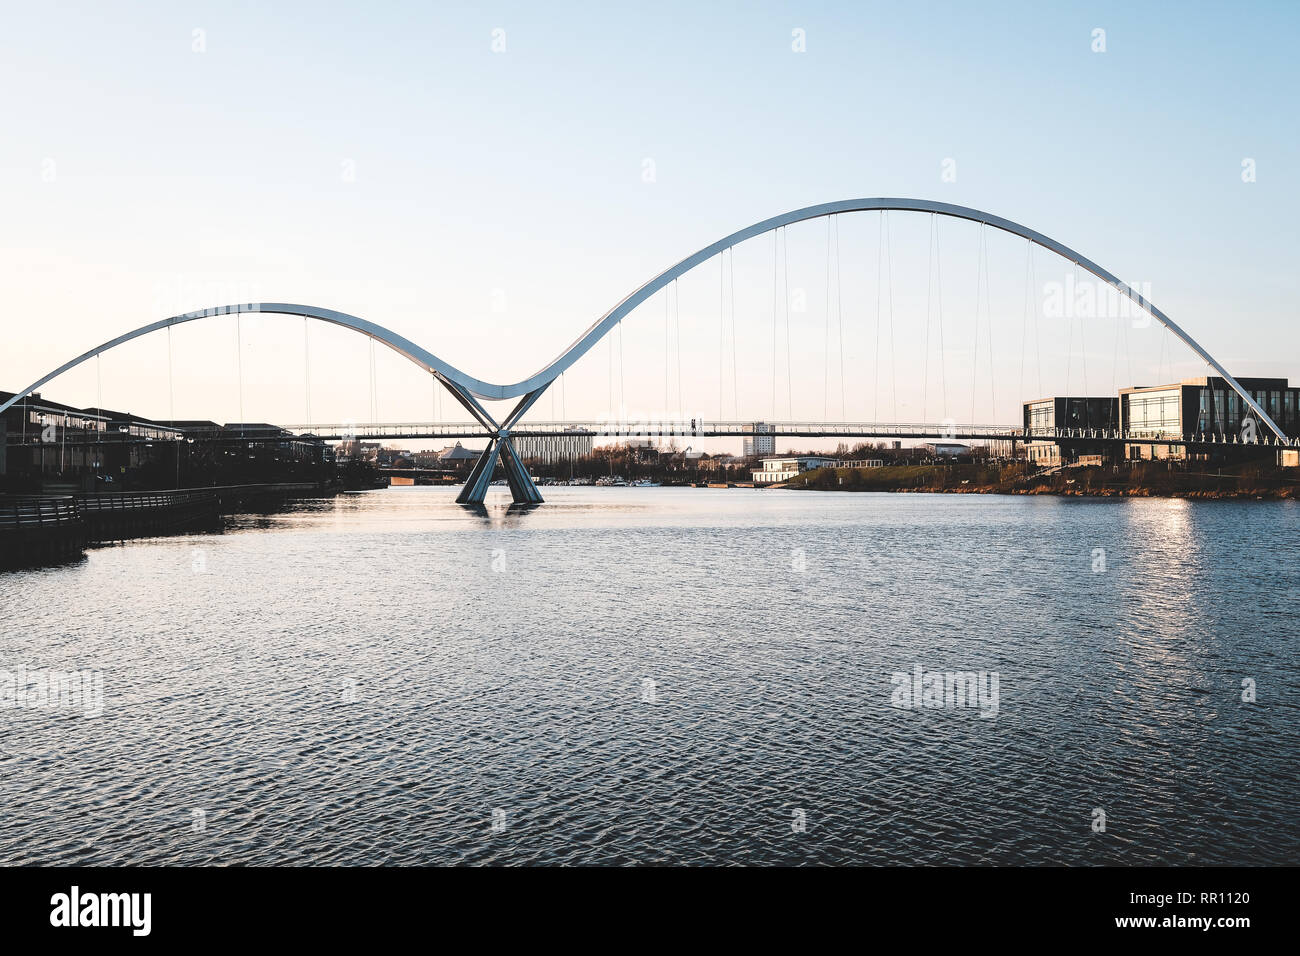 The Infinity Bridge in Stockton-on-Tees, England Stock Photo